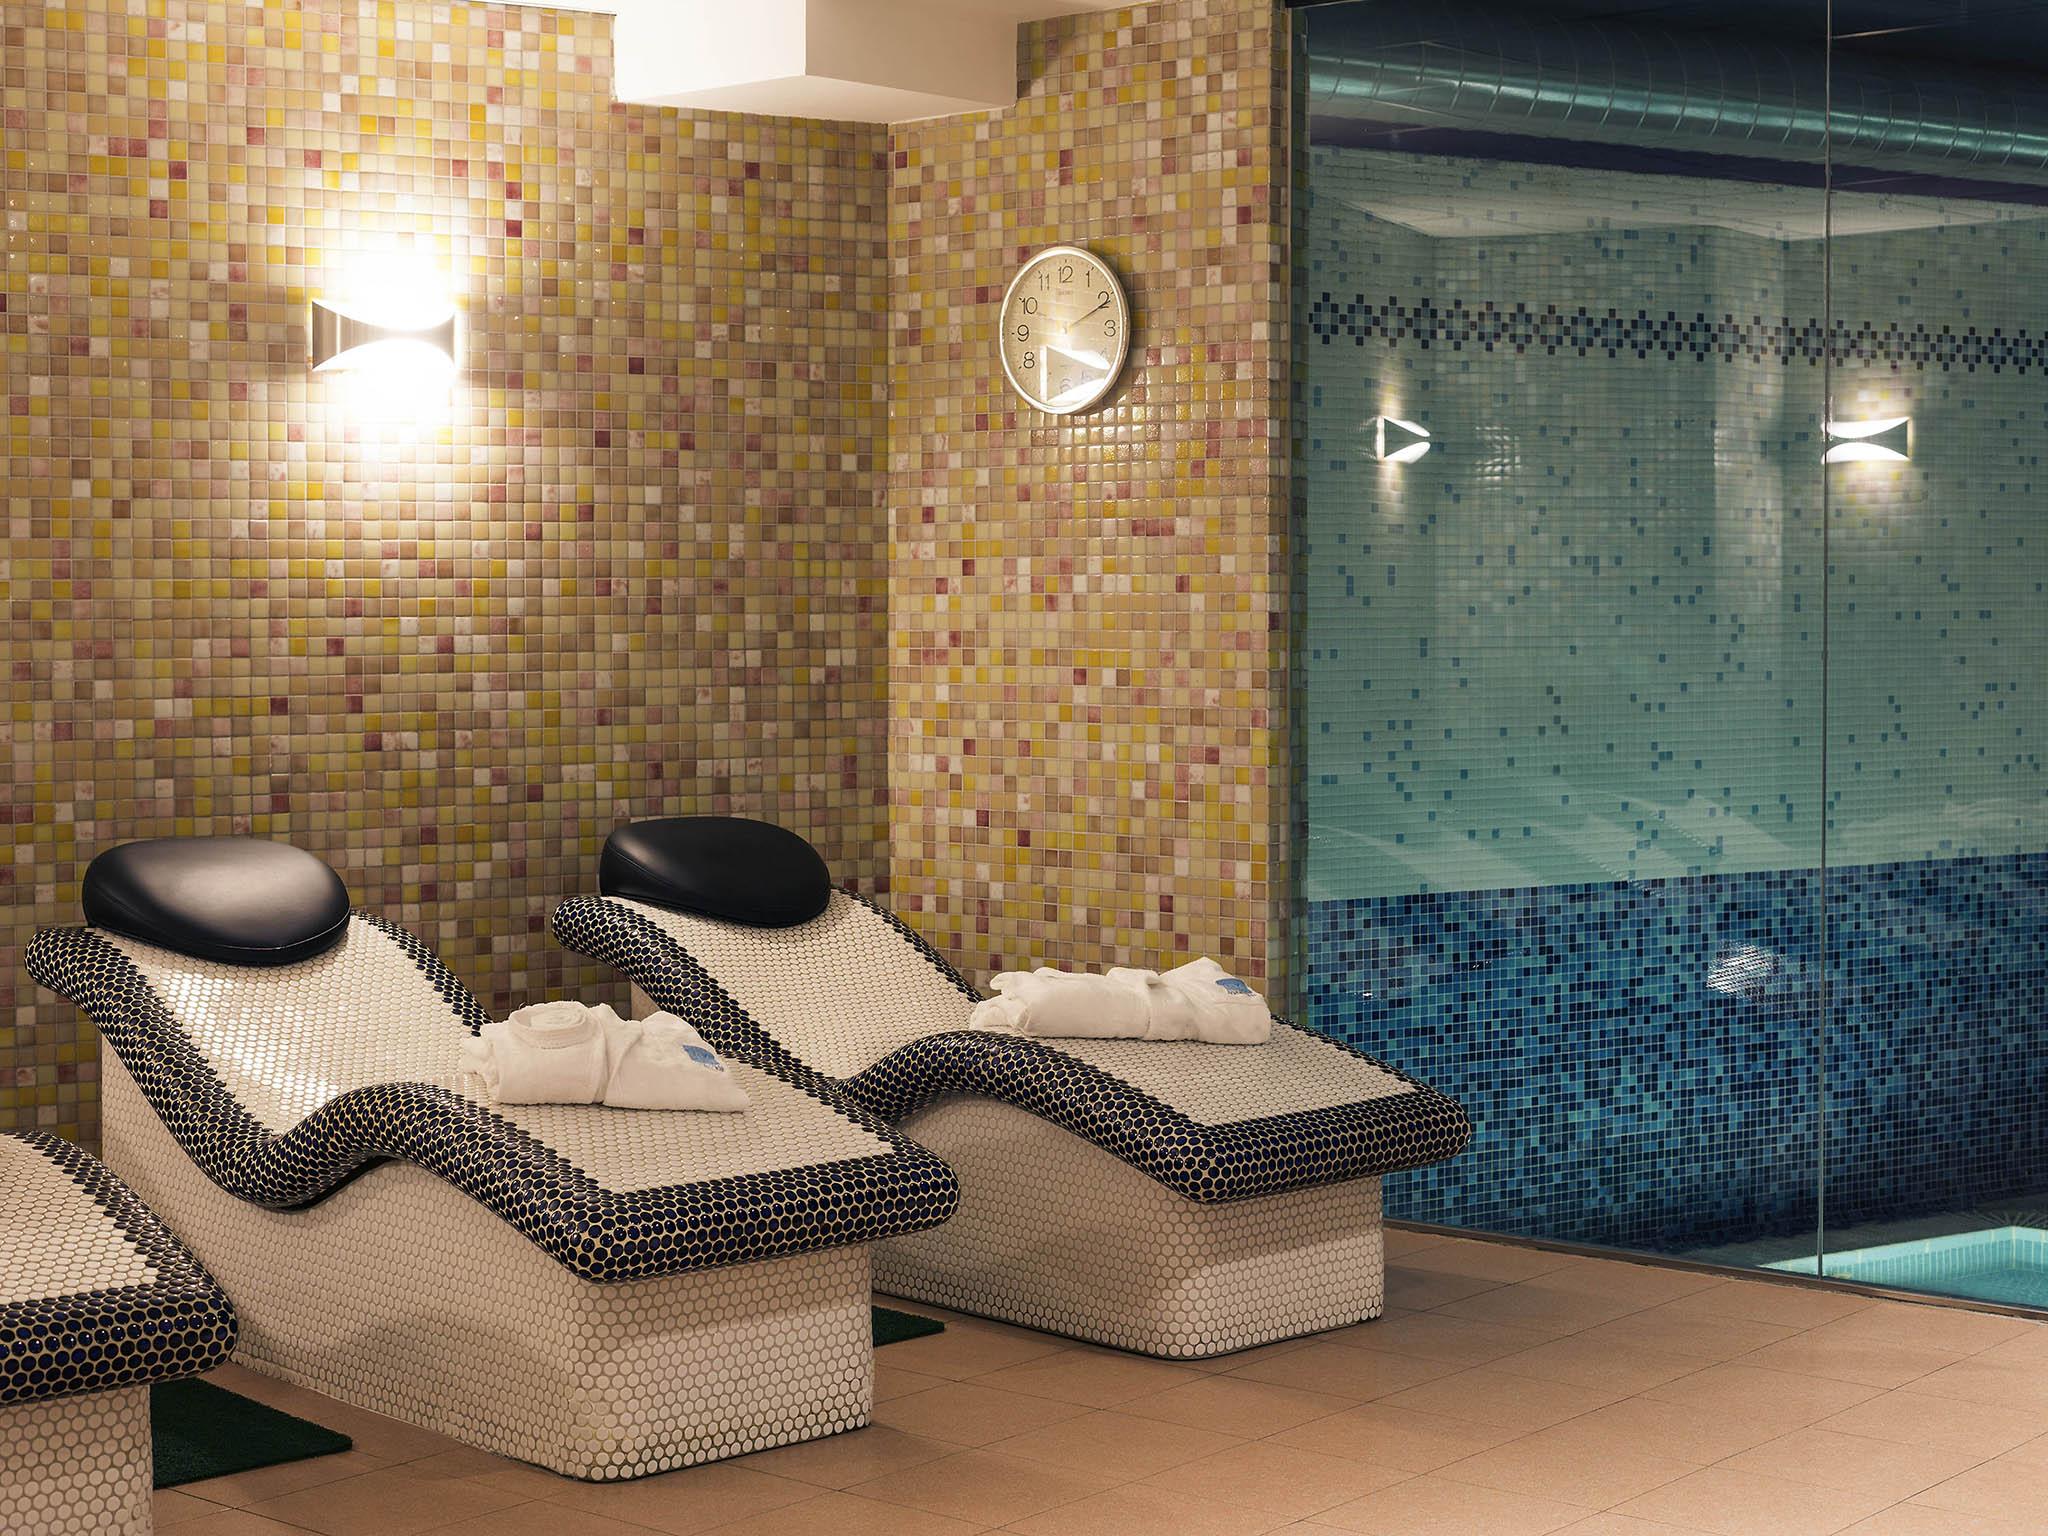 Hotel di mercure bilbao jardines de albia mercure bilbao for Jardines de albia spa